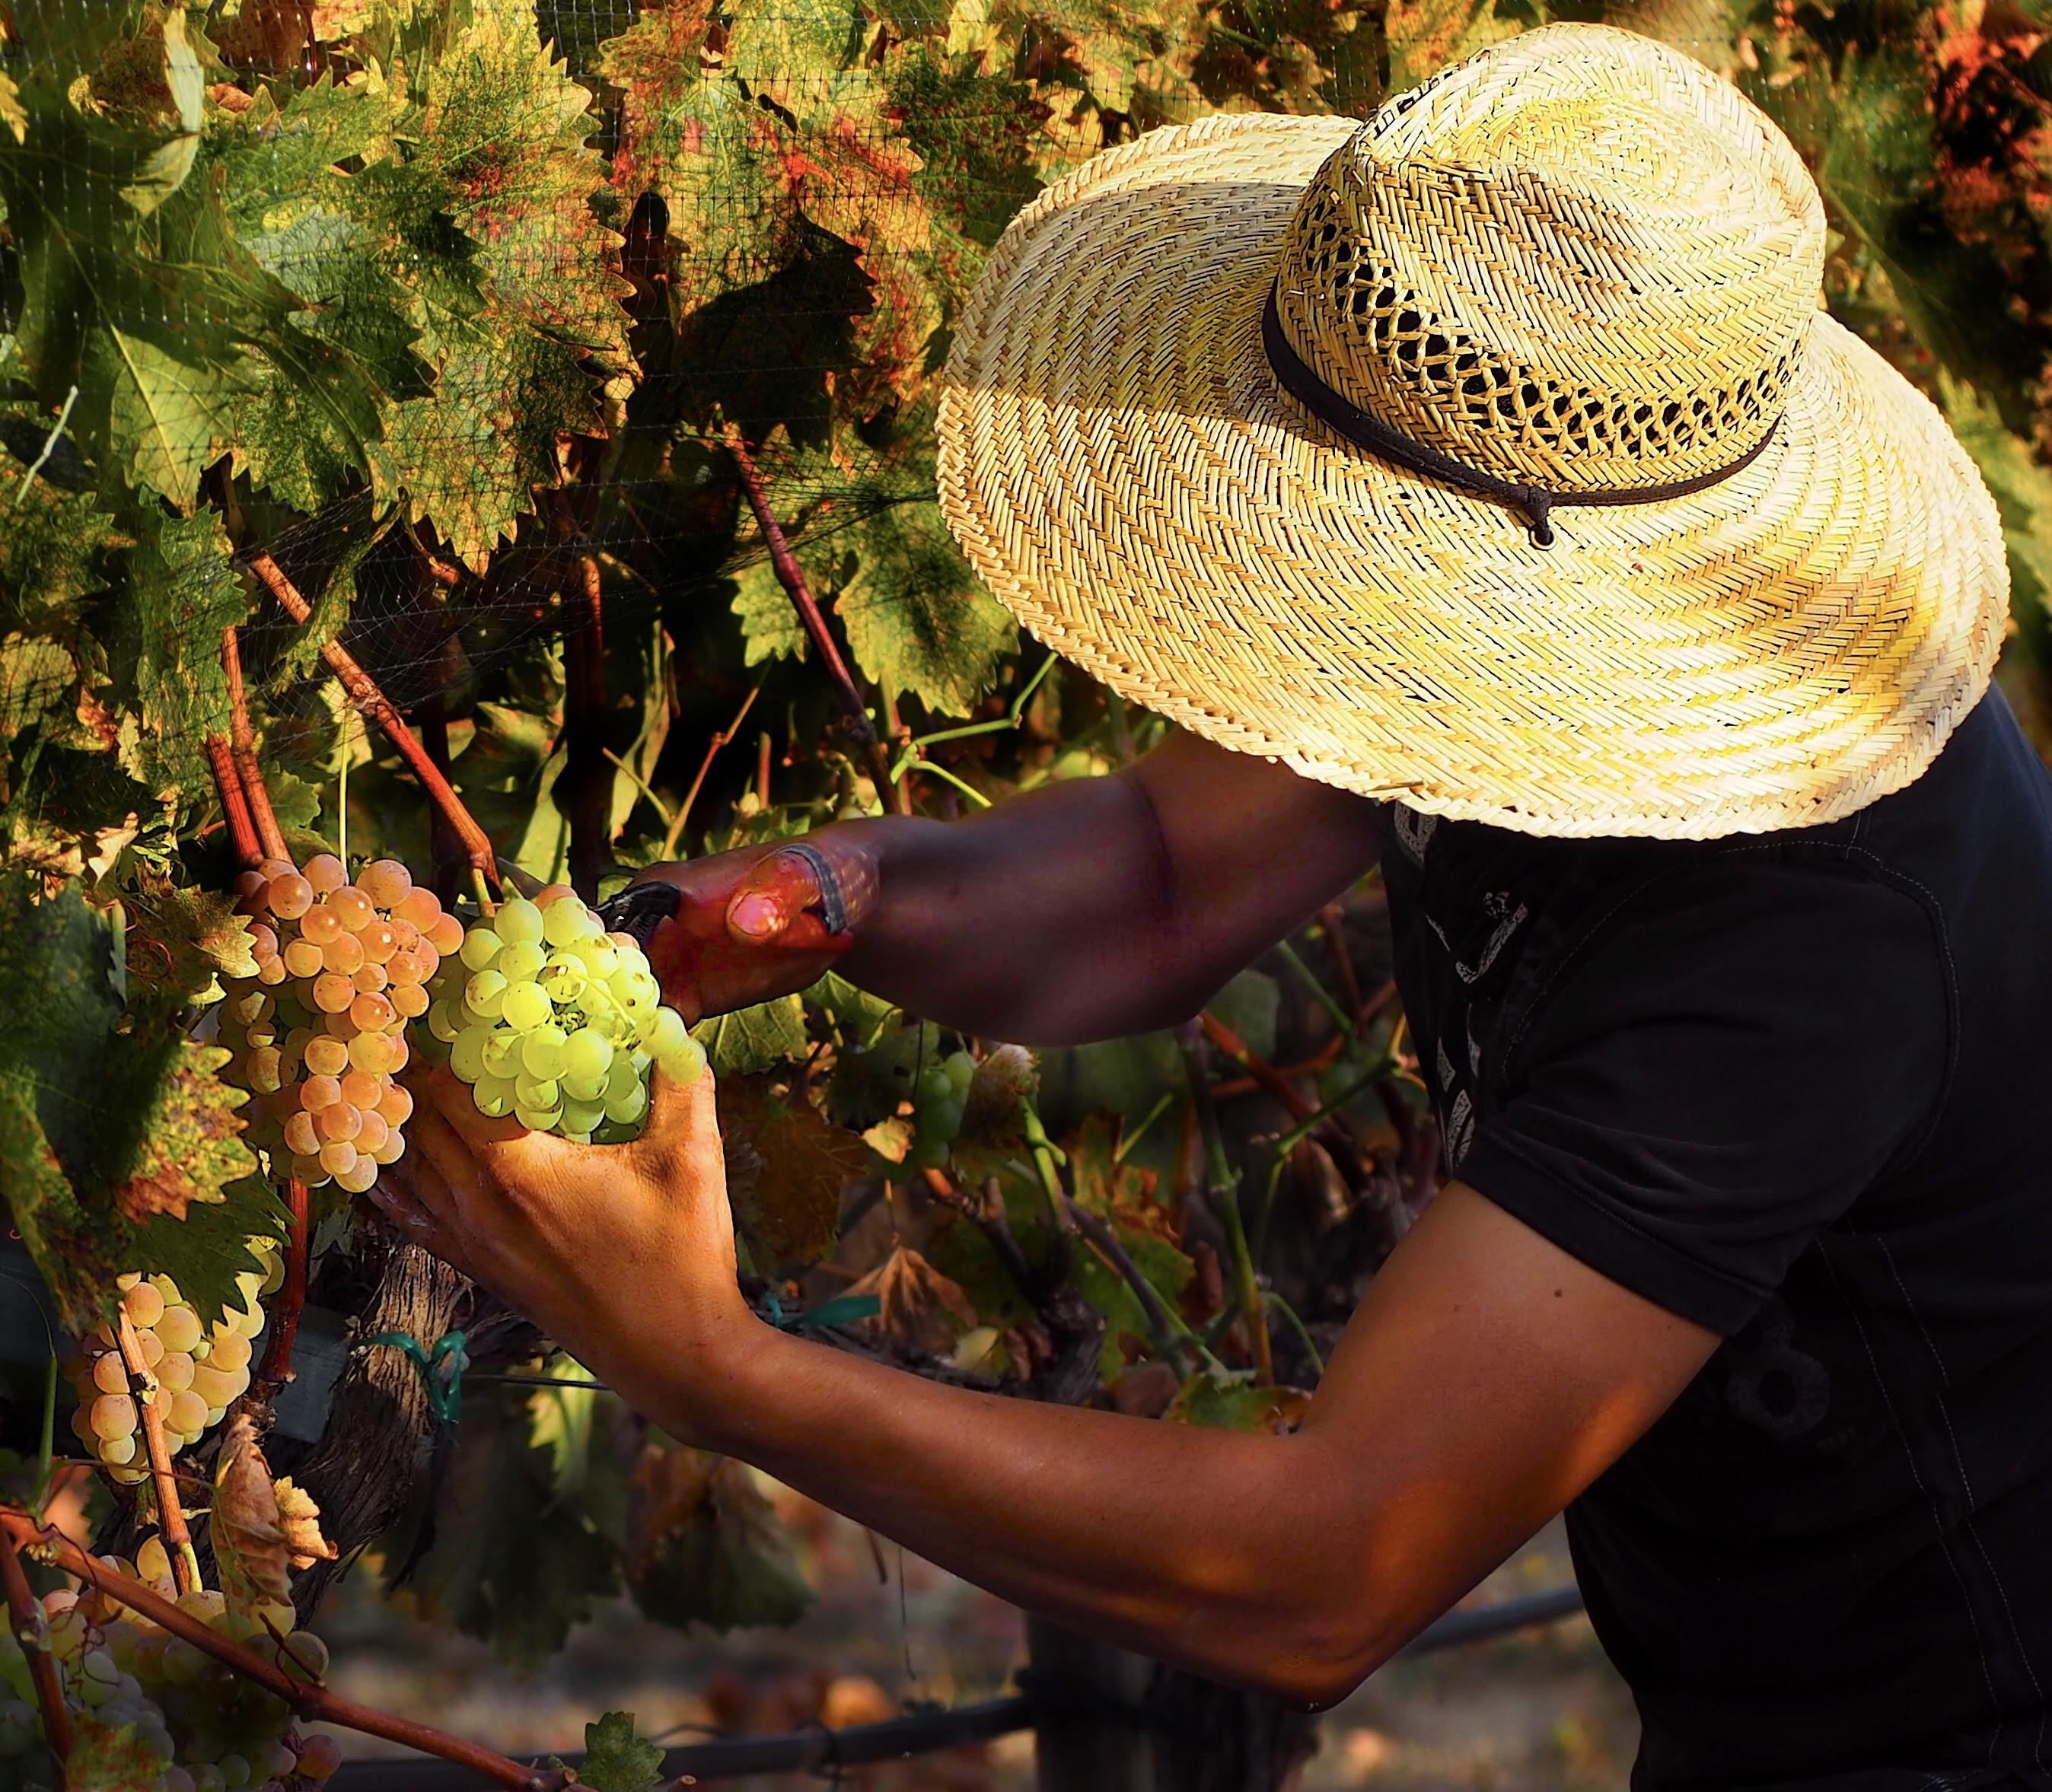 Biodynamic Wines 101 with Ashland Wine Cellar